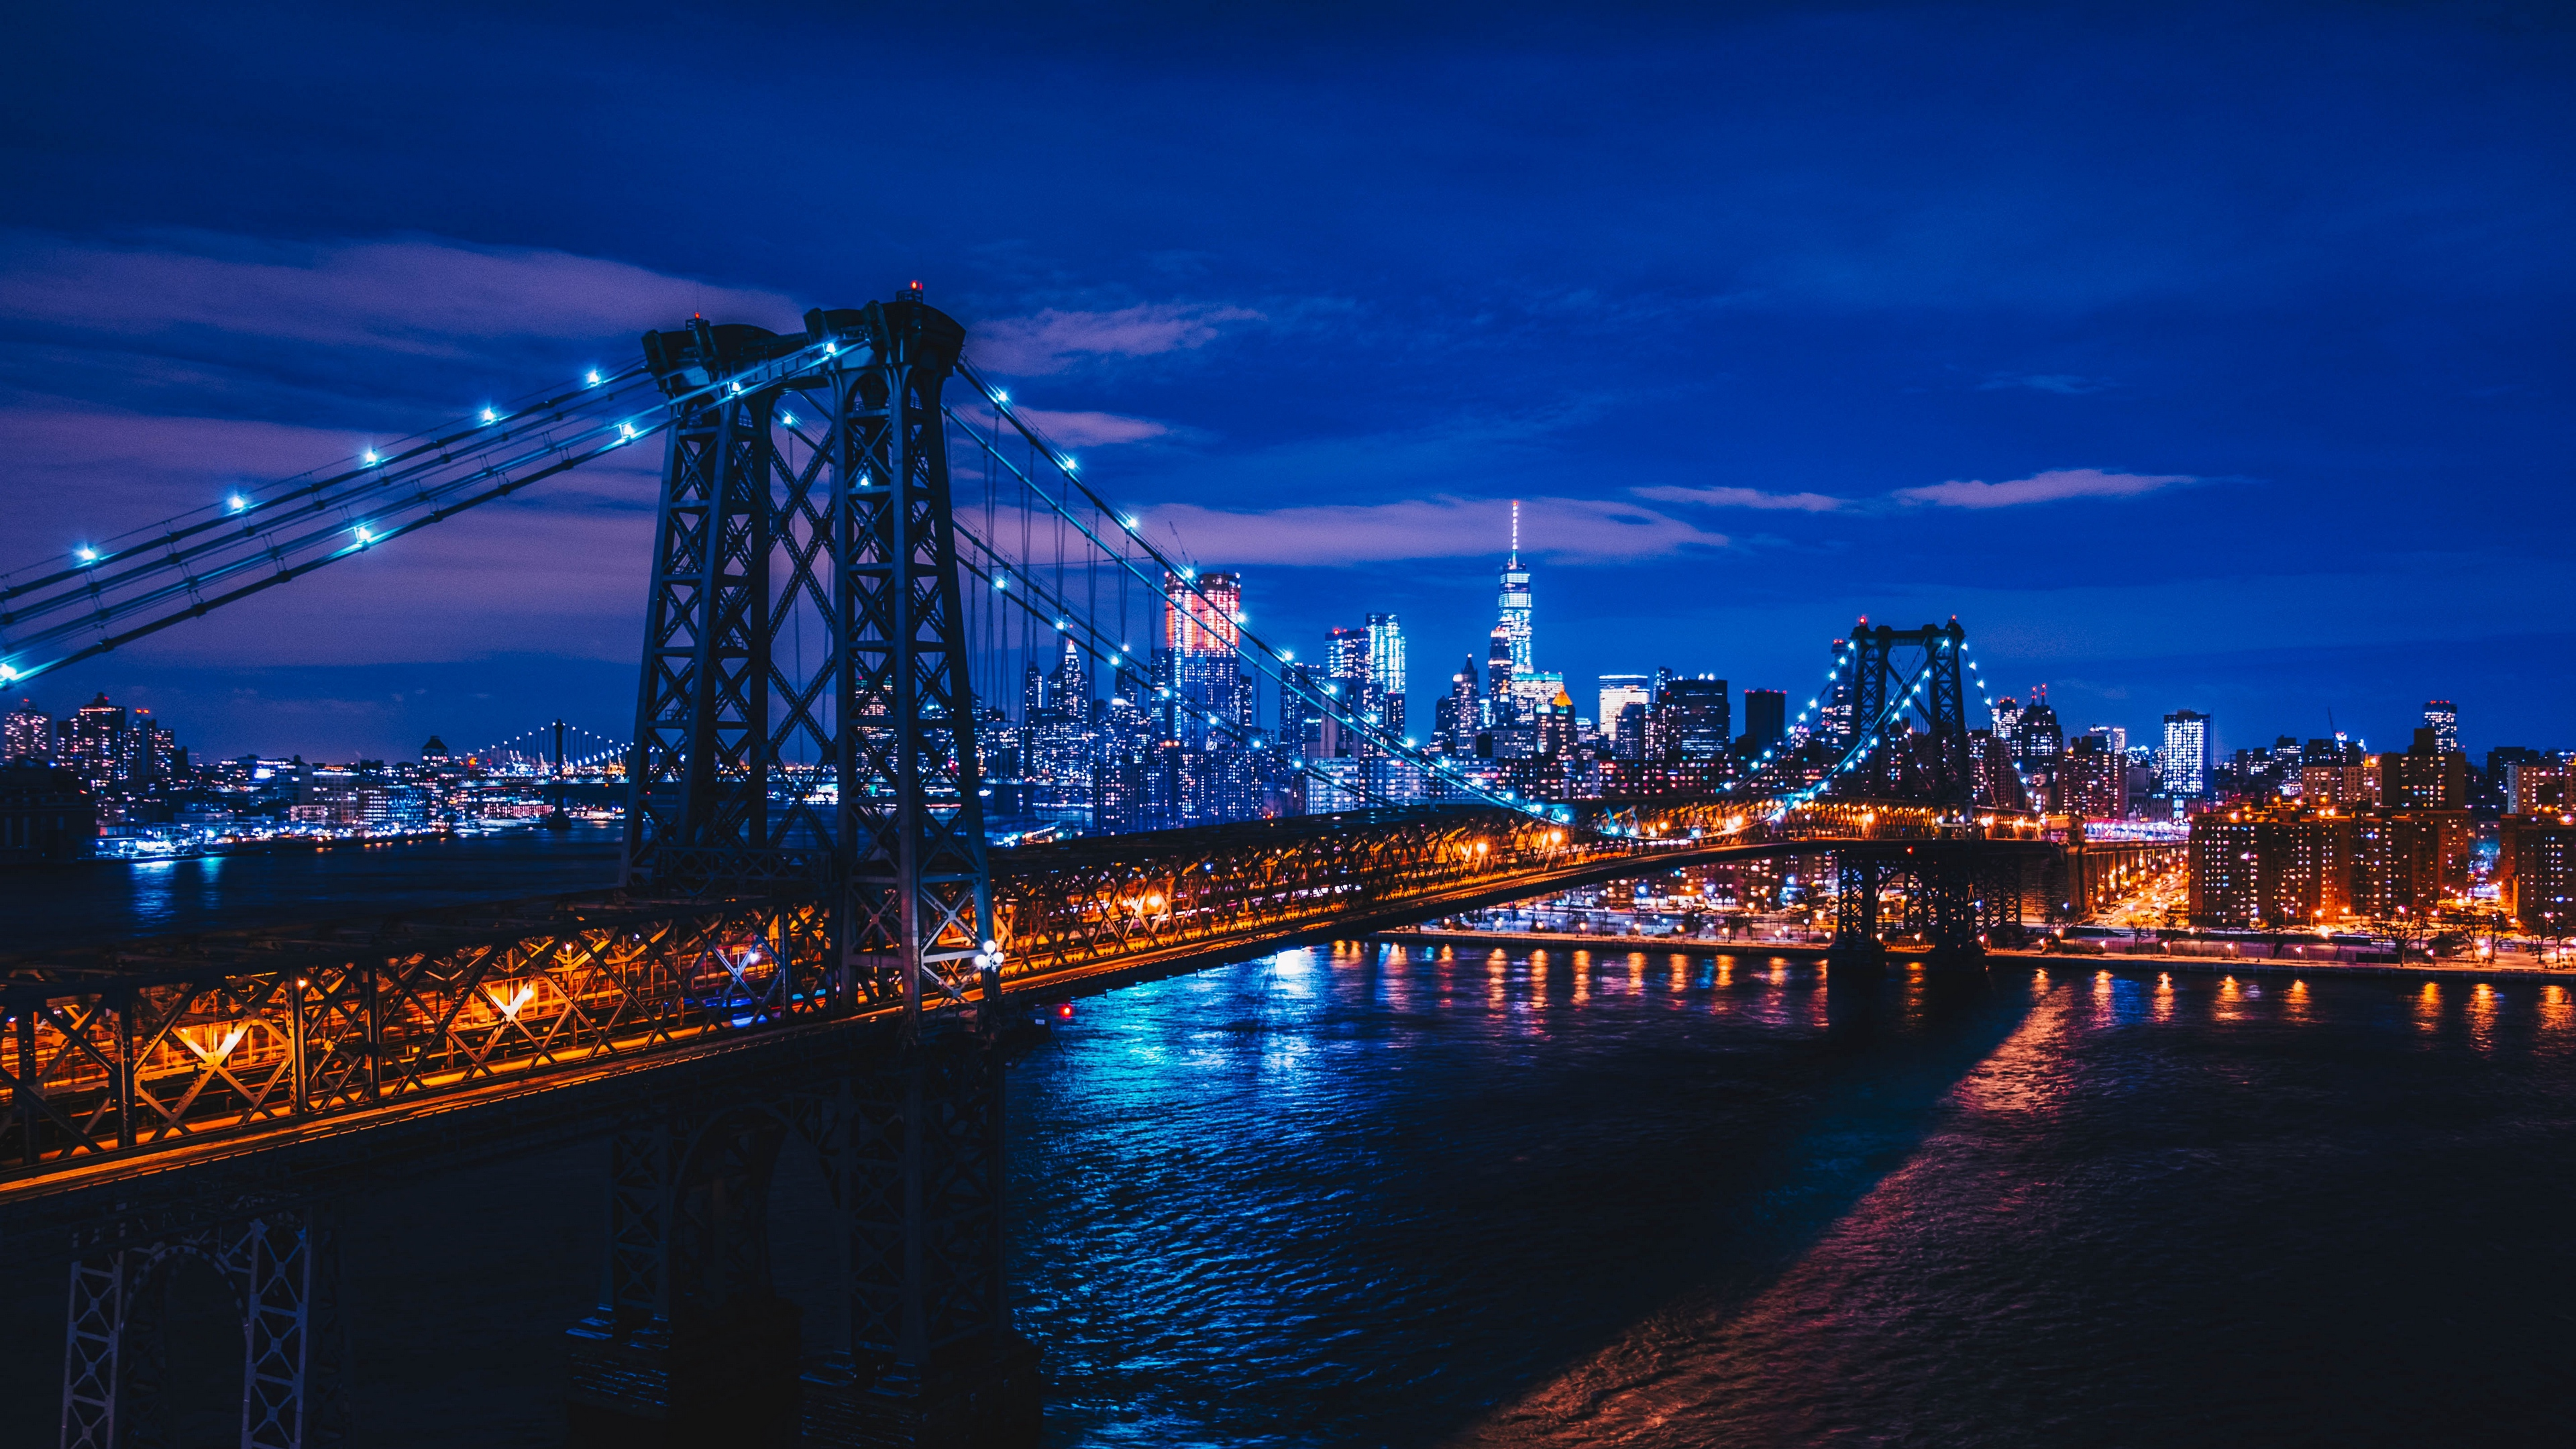 Wallpaper 4k New York Usa Night City Bridge 4k New York